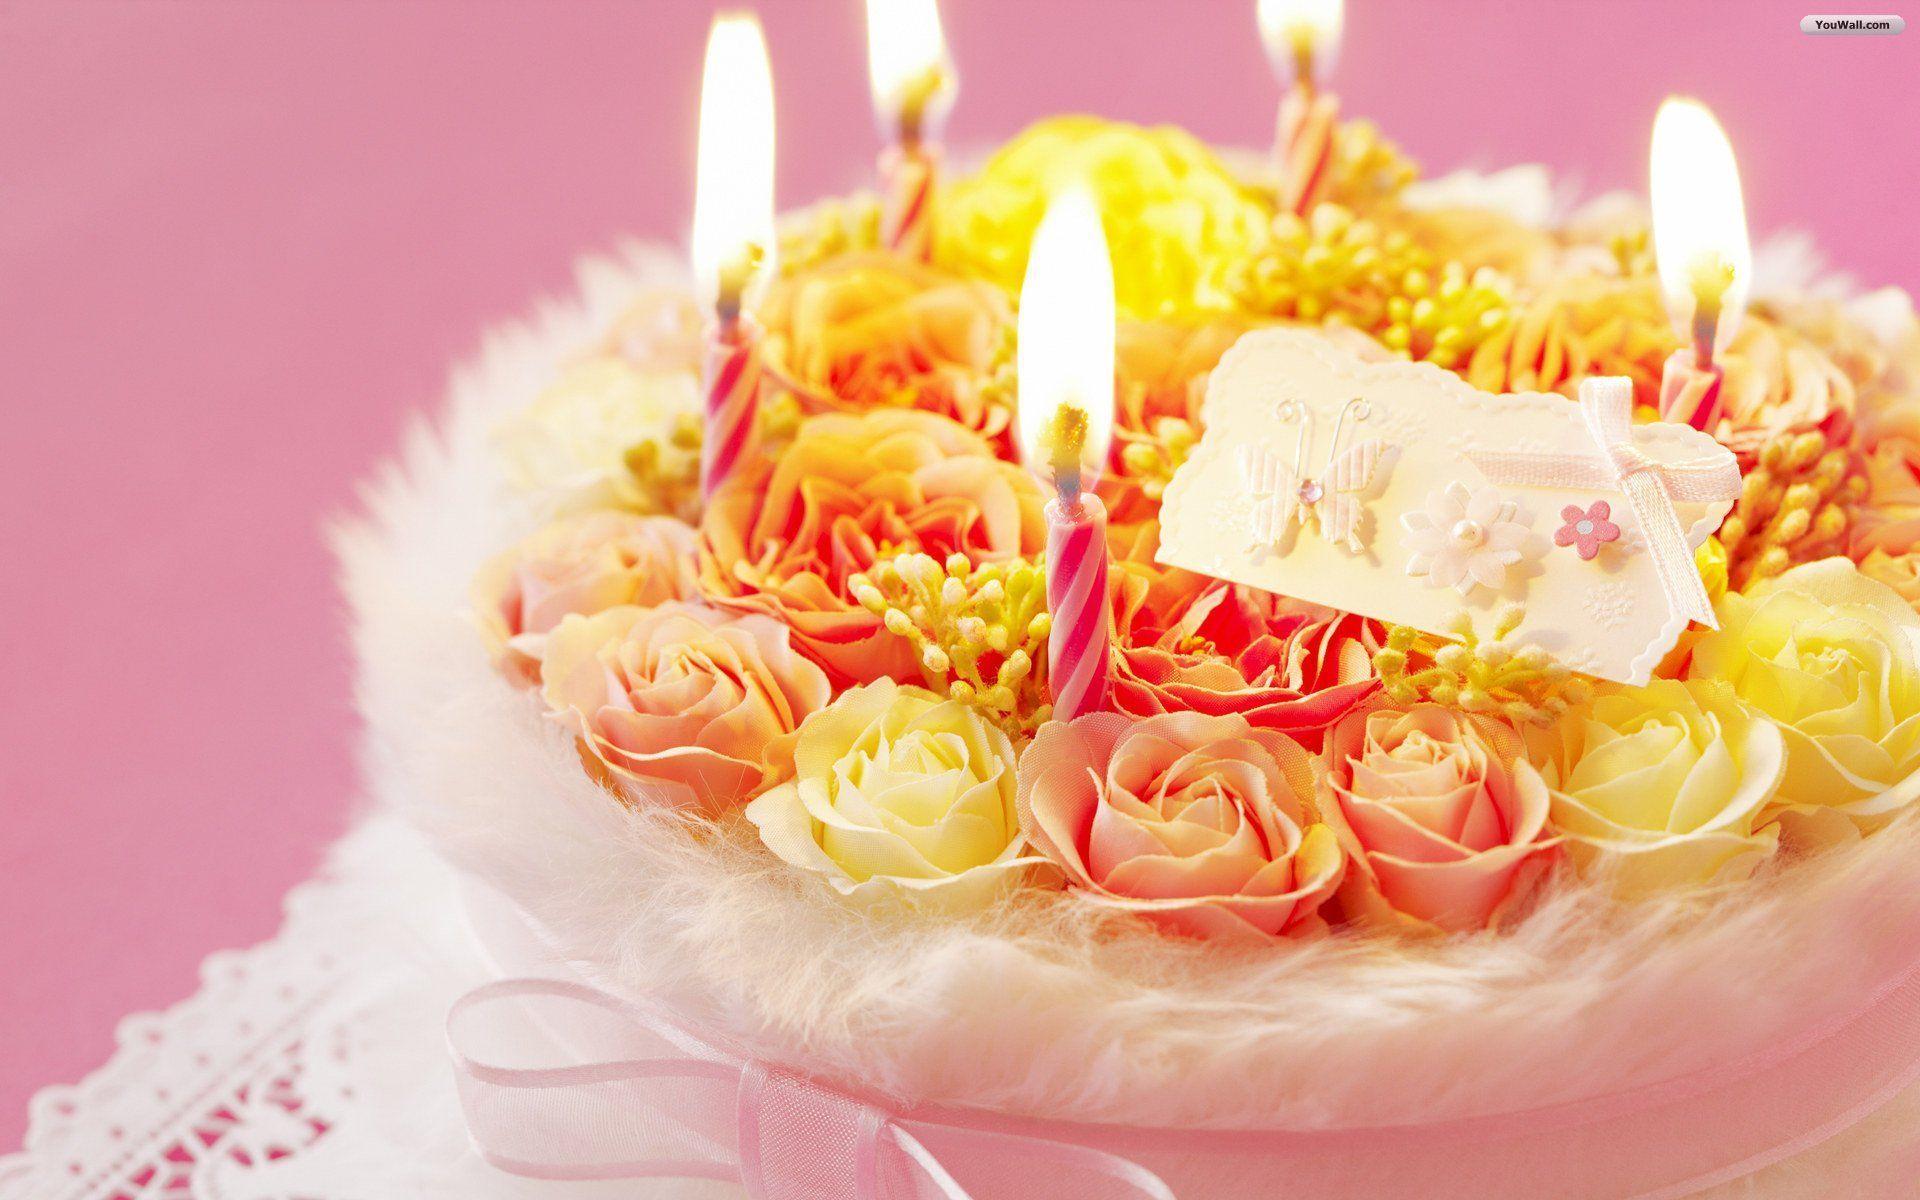 YouWall Birthday Cake Wallpaper wallpaperwallpapersfree